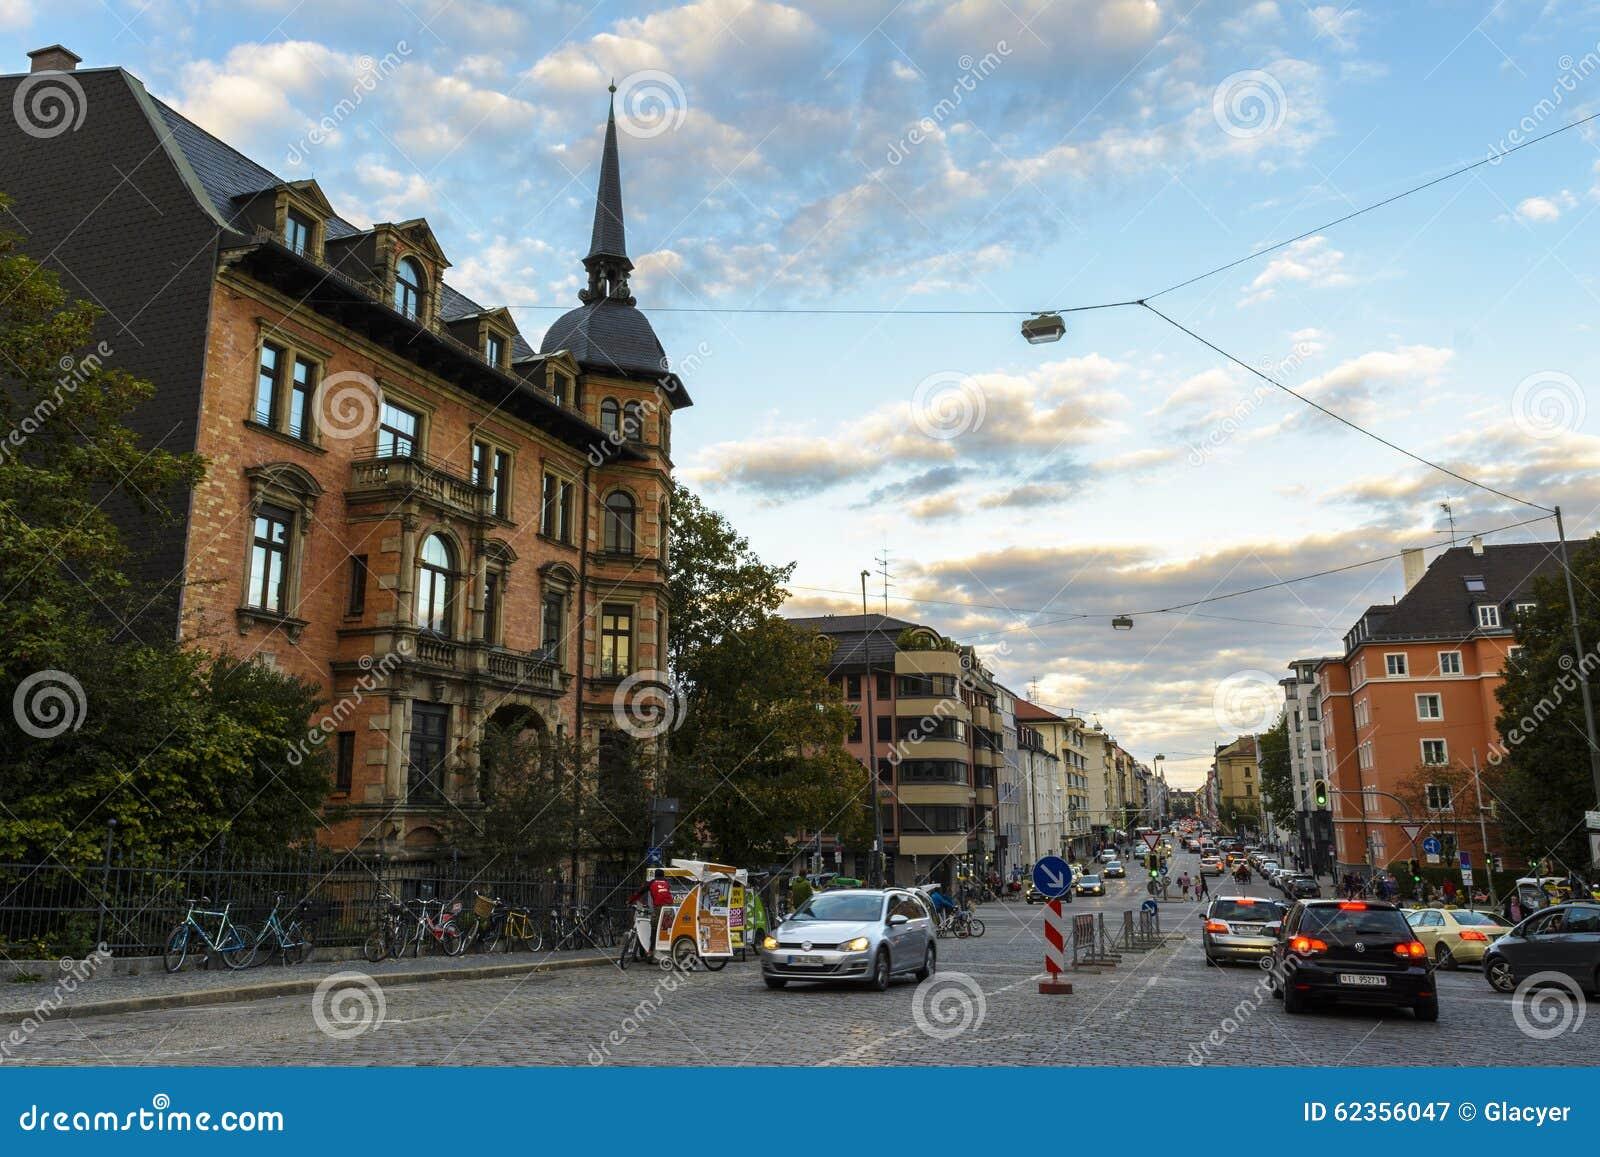 street addresses germany